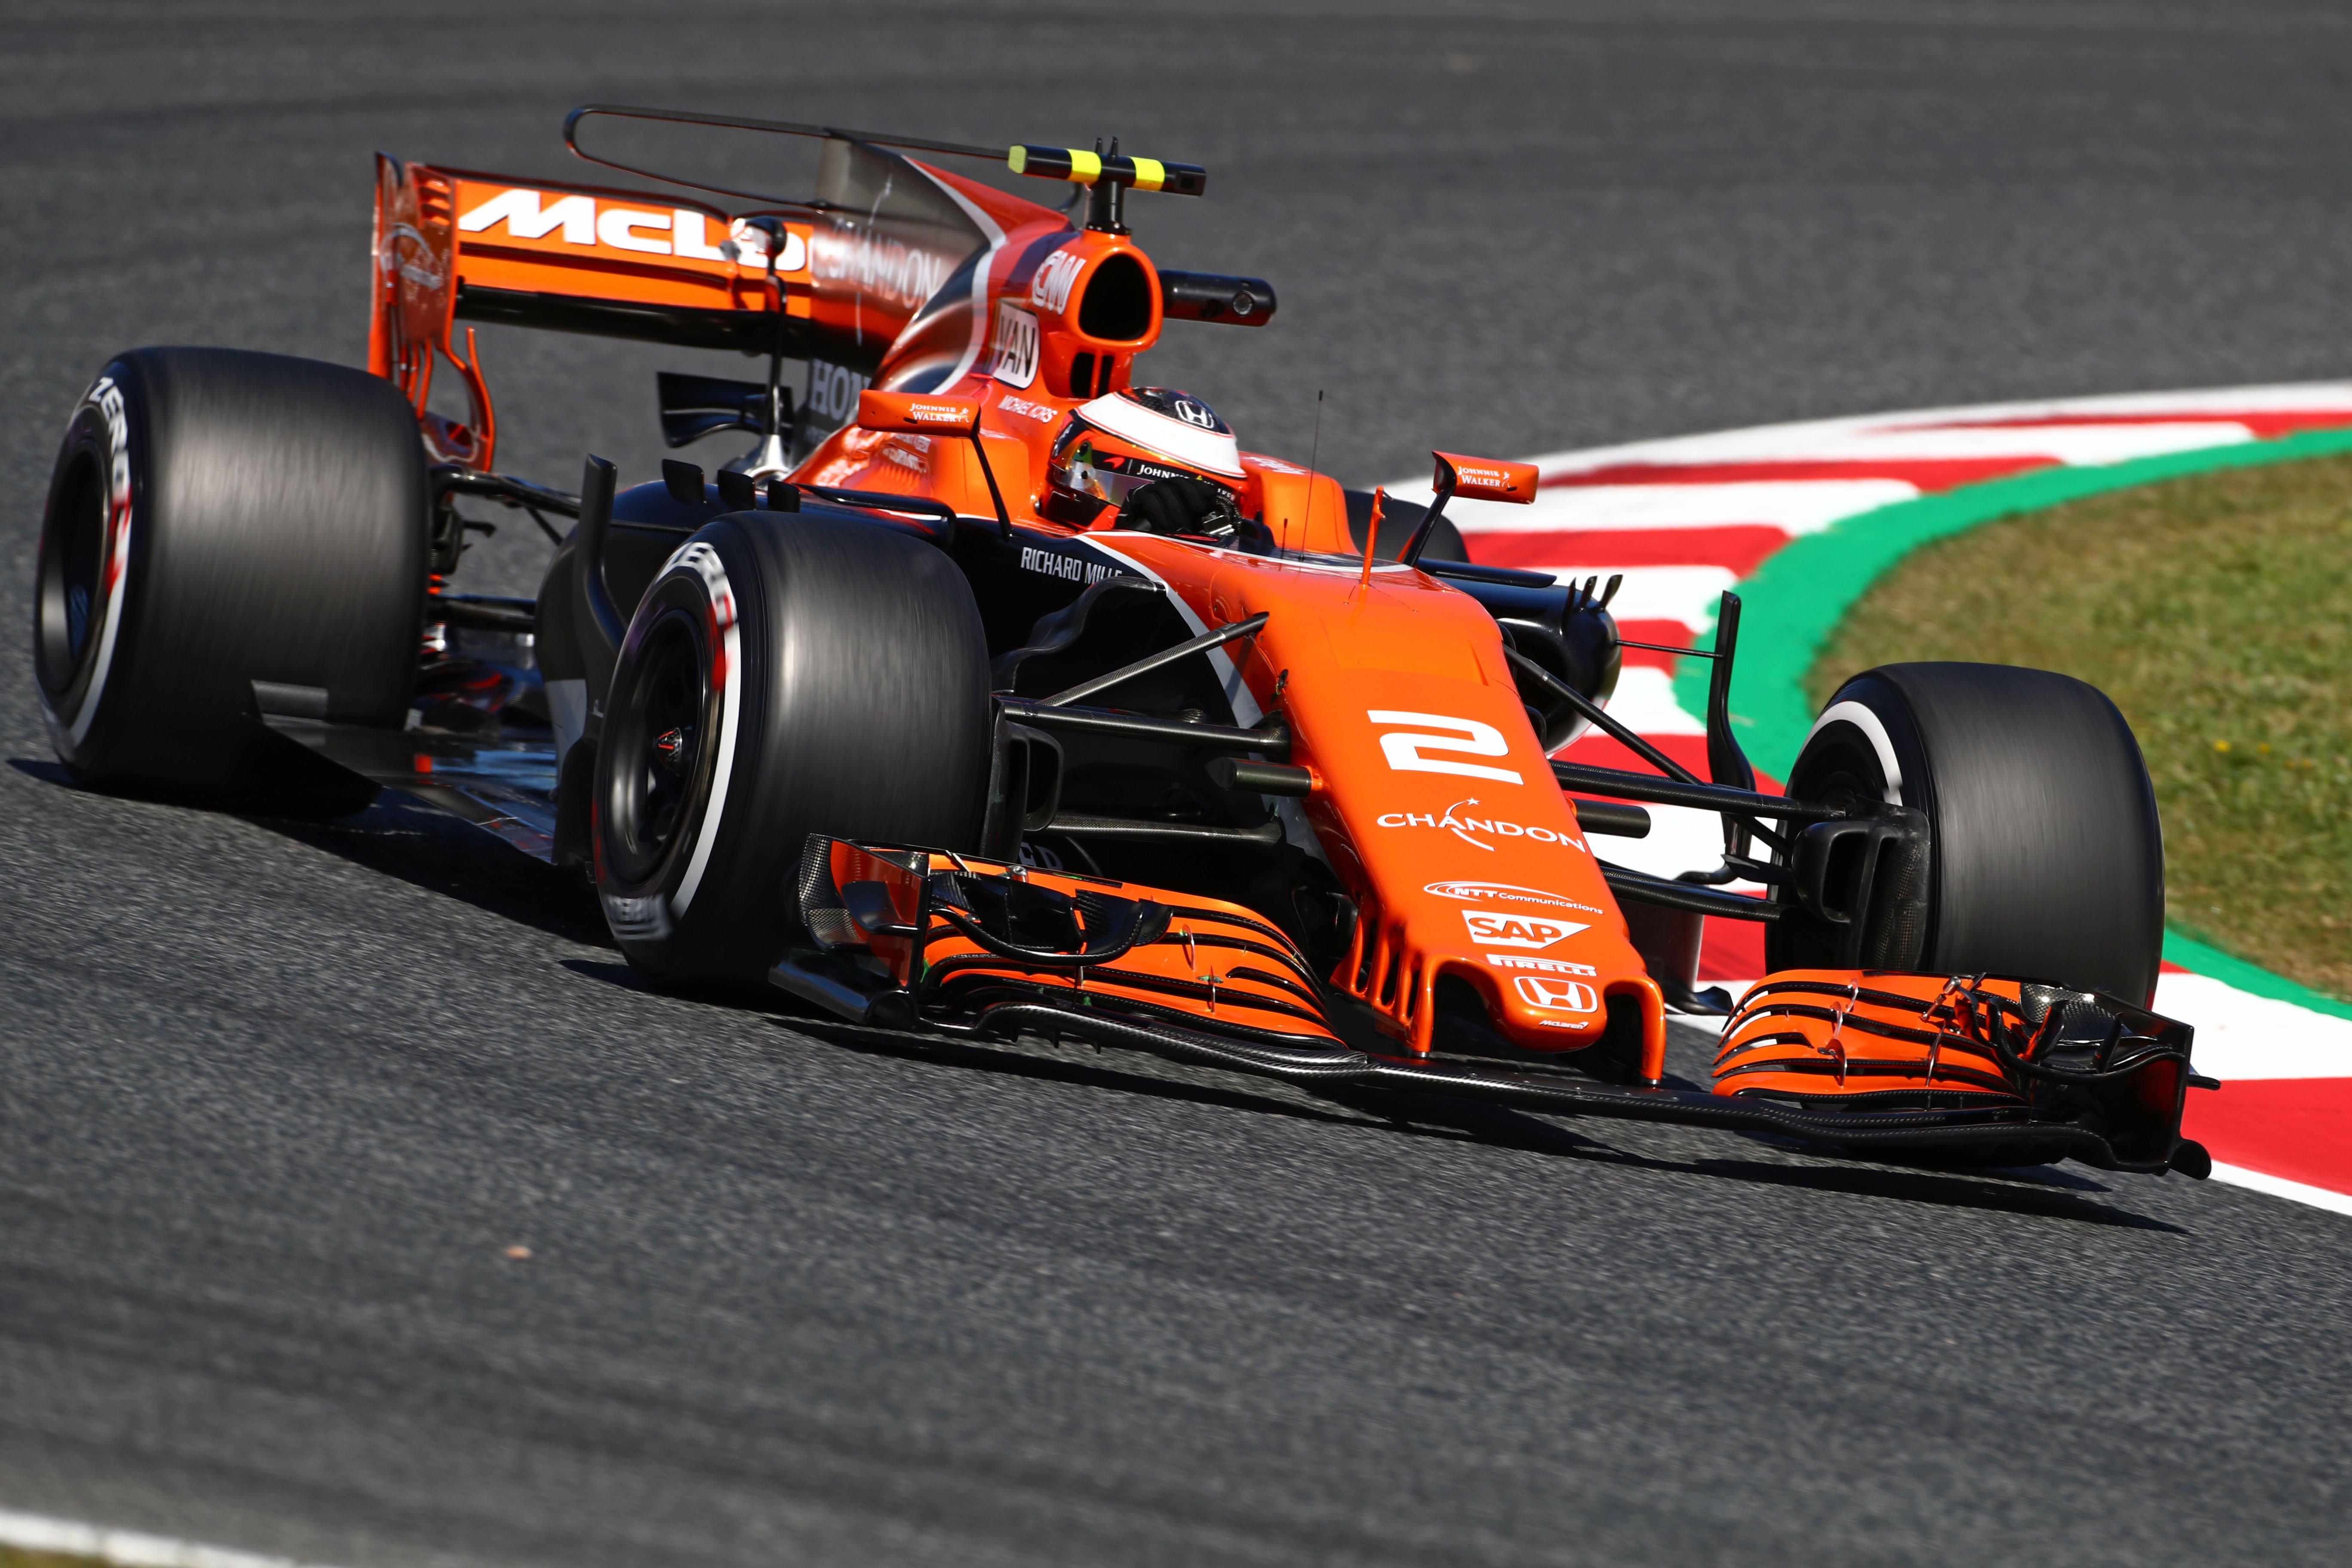 Formula One World Championship 2017, Round 5, Spannish Grand Prix, Barcelona, Spain, Friday 12 May 2017 – Stoffel Vandoorne (BEL) McLaren F1